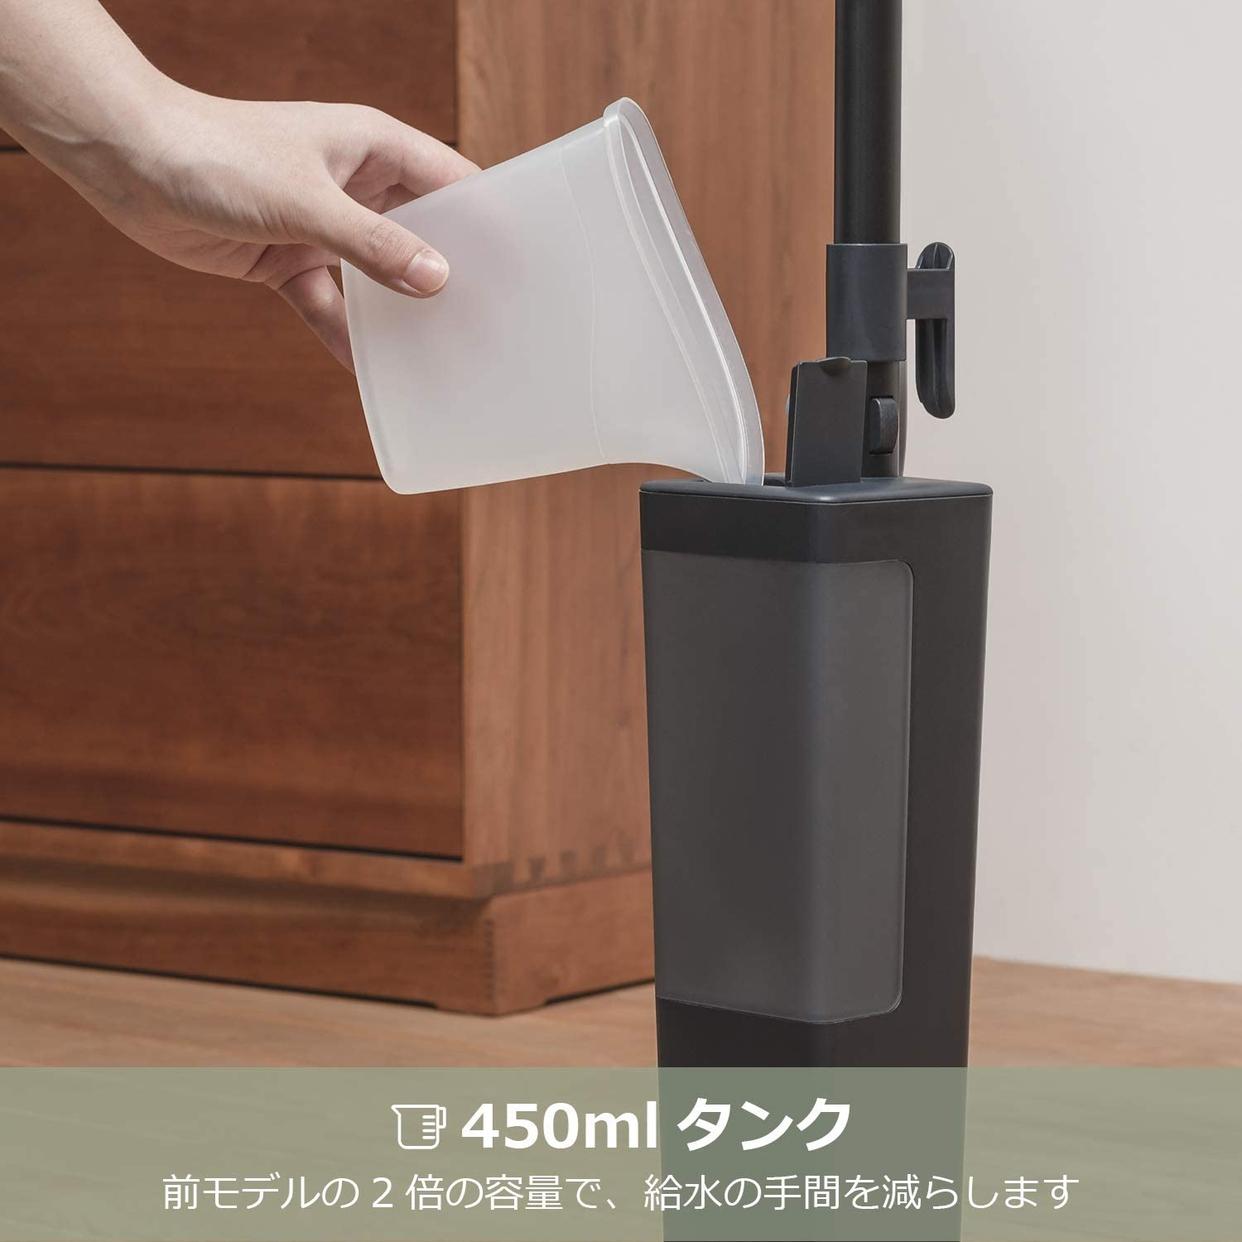 &ELEPGANT(アンドエレファント) Light'n'Easy SteamGo モップタイプ S5の商品画像4